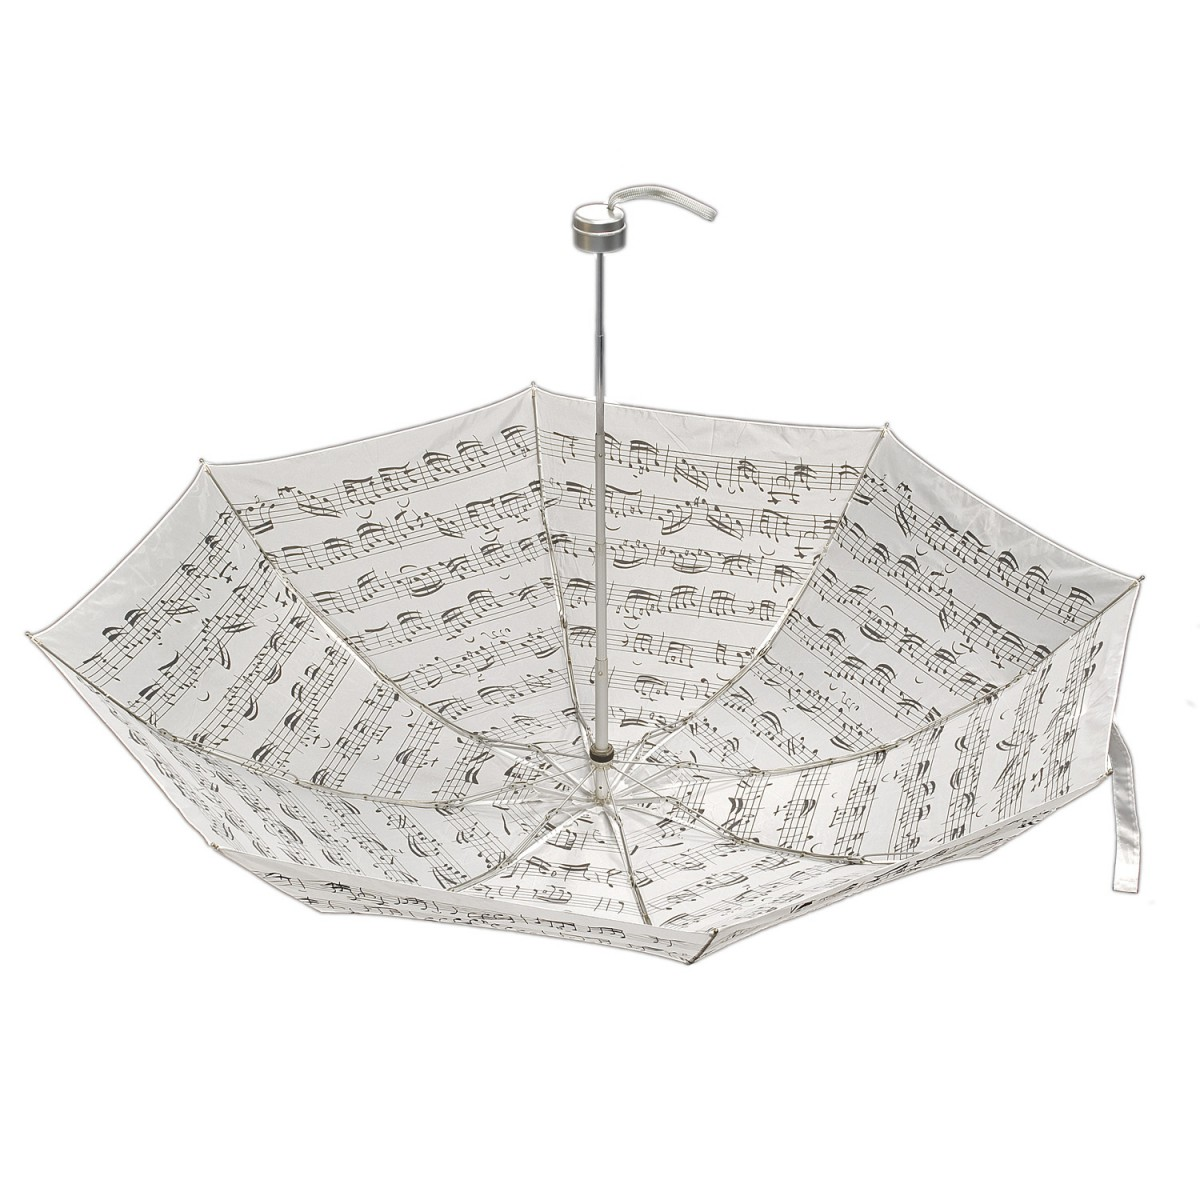 Regenschirm mini, umbrella, notes